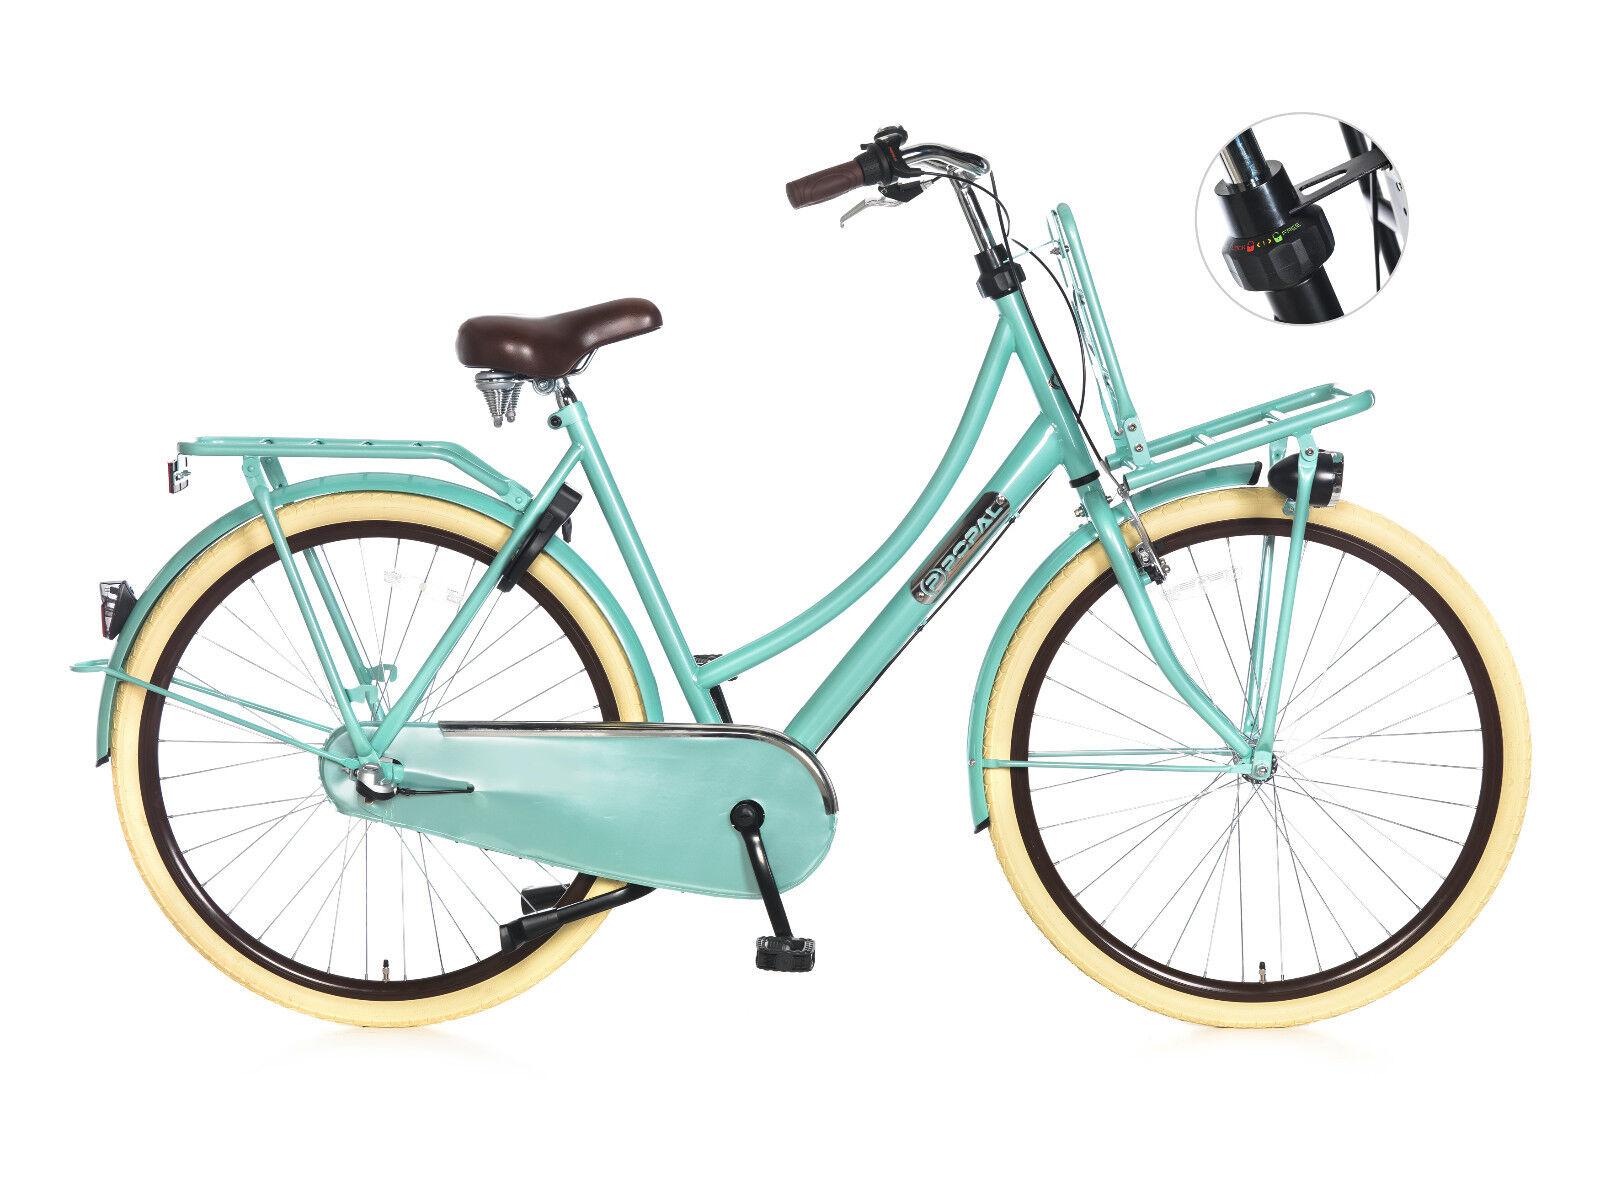 28  Daily Dutch, Vélo hollandais, Dutch Bike, turquoise 3 speed Shimano NEW